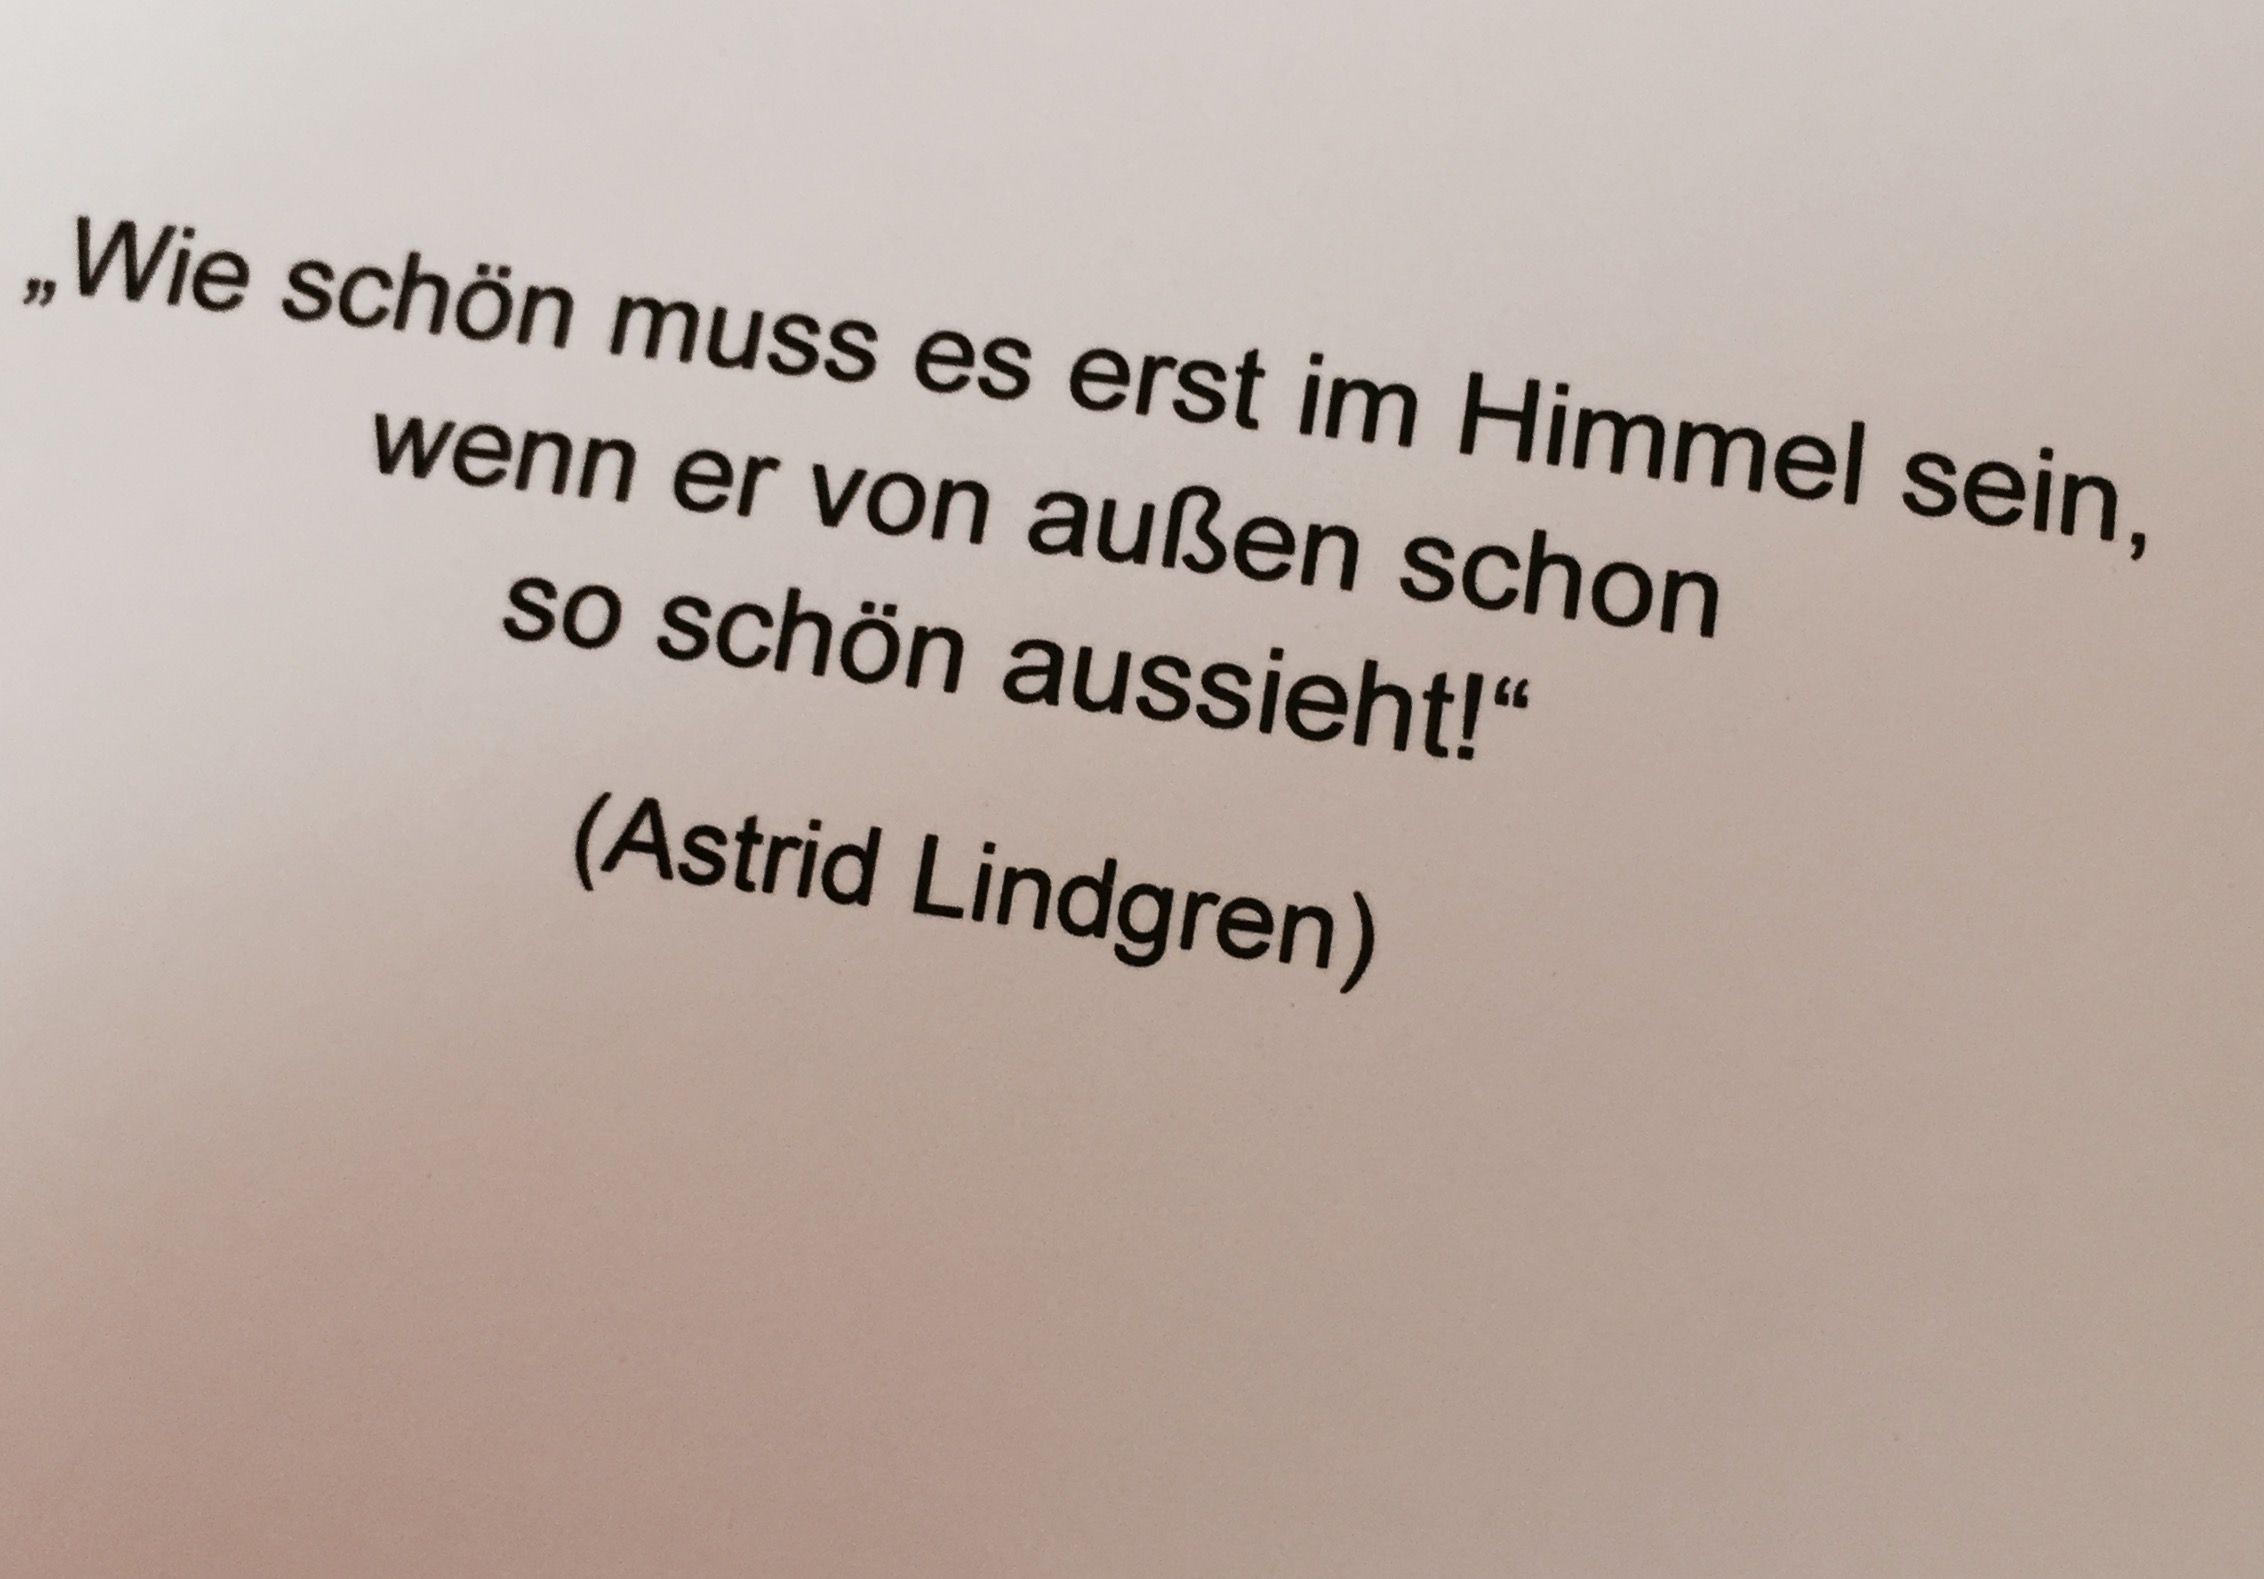 astrid lindgren sprüche Astrid Lindgren / Zitat | quotes | | Zitate, Astrid lindgren  astrid lindgren sprüche